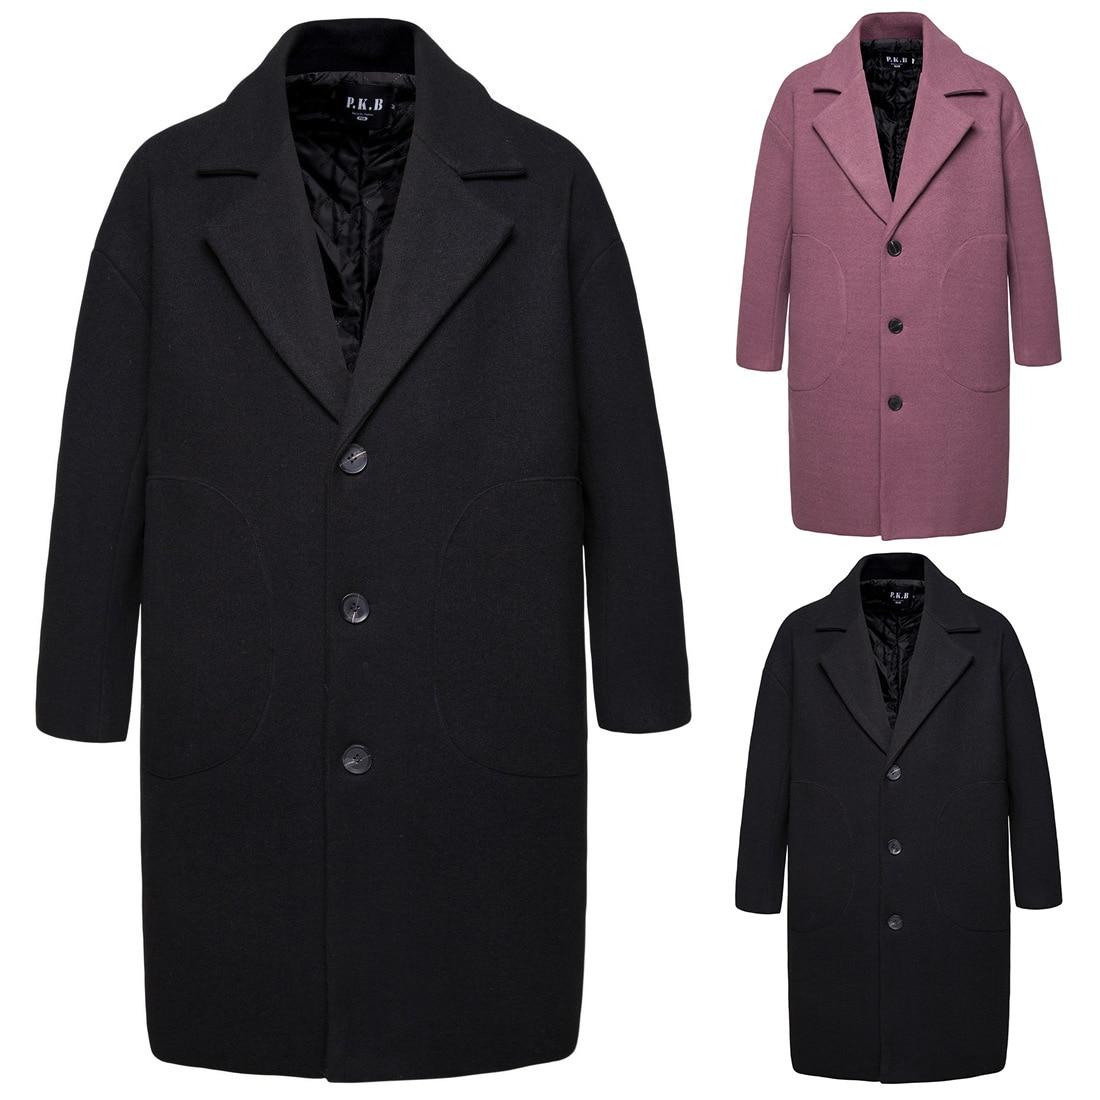 2019 Autumn & Winter Foreign Trade Trench Coat Men Mid-length Korean-style Woolen Jacket Spring And Autumn Handsome Woolen Coat